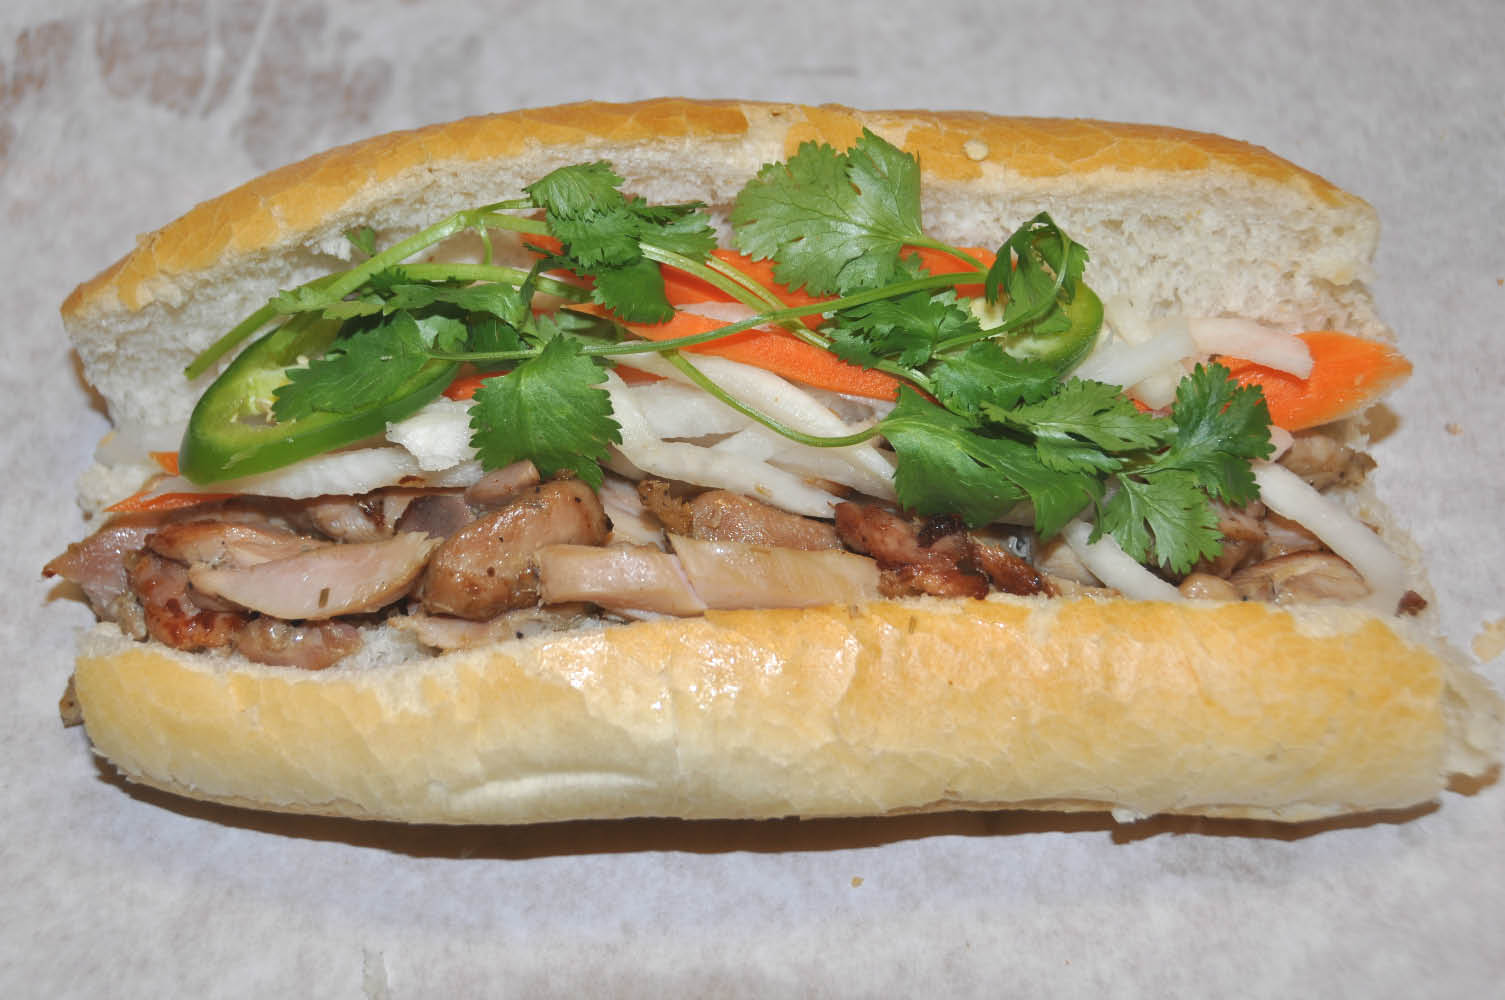 Delicious Vietnamese sandwiches available near San Lorenzo, CA